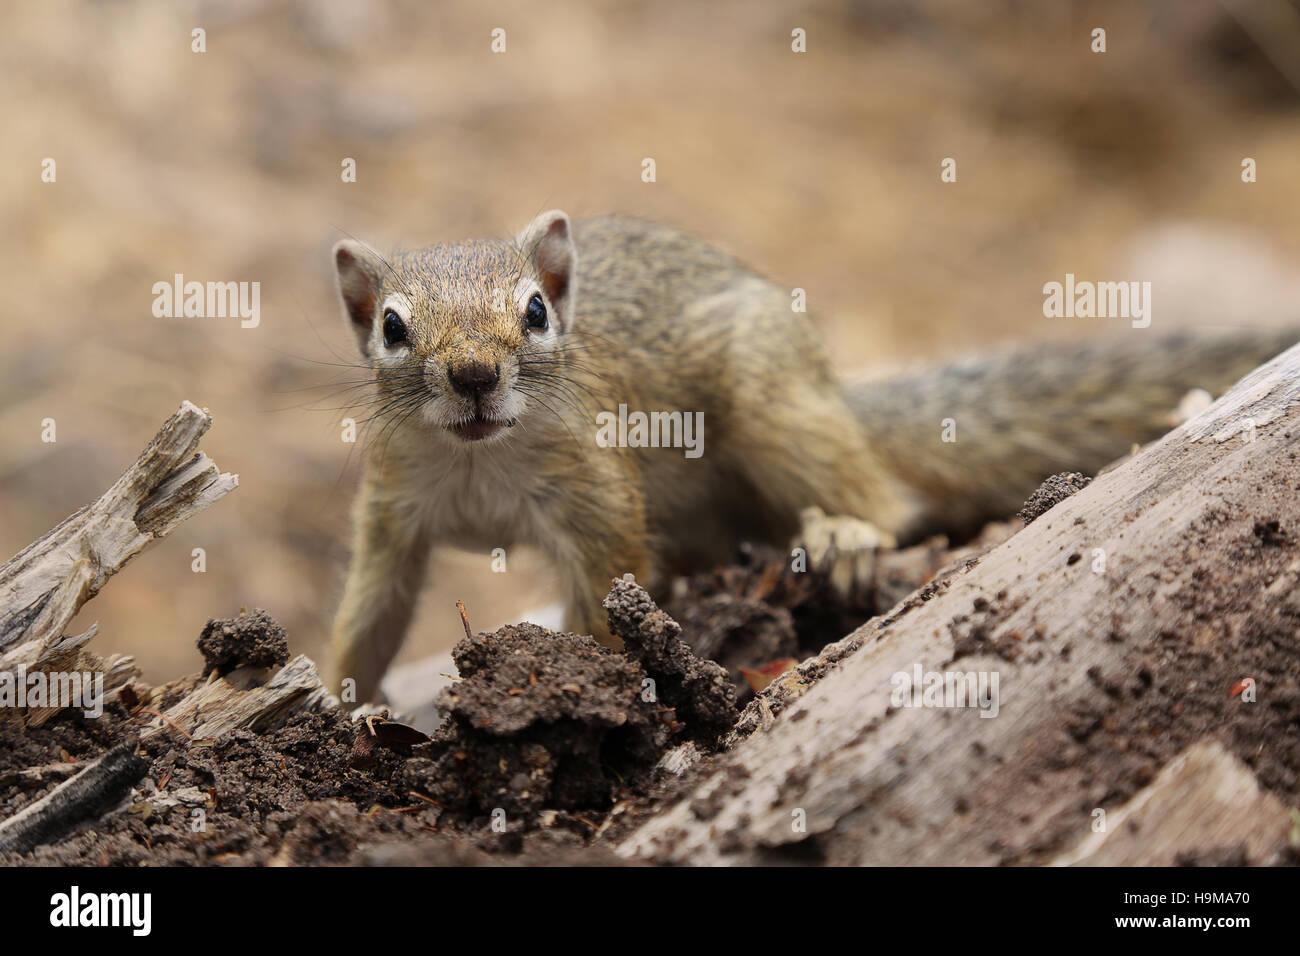 Ground Squirrel looking at you at Etosha National Park Namibia - Stock Image